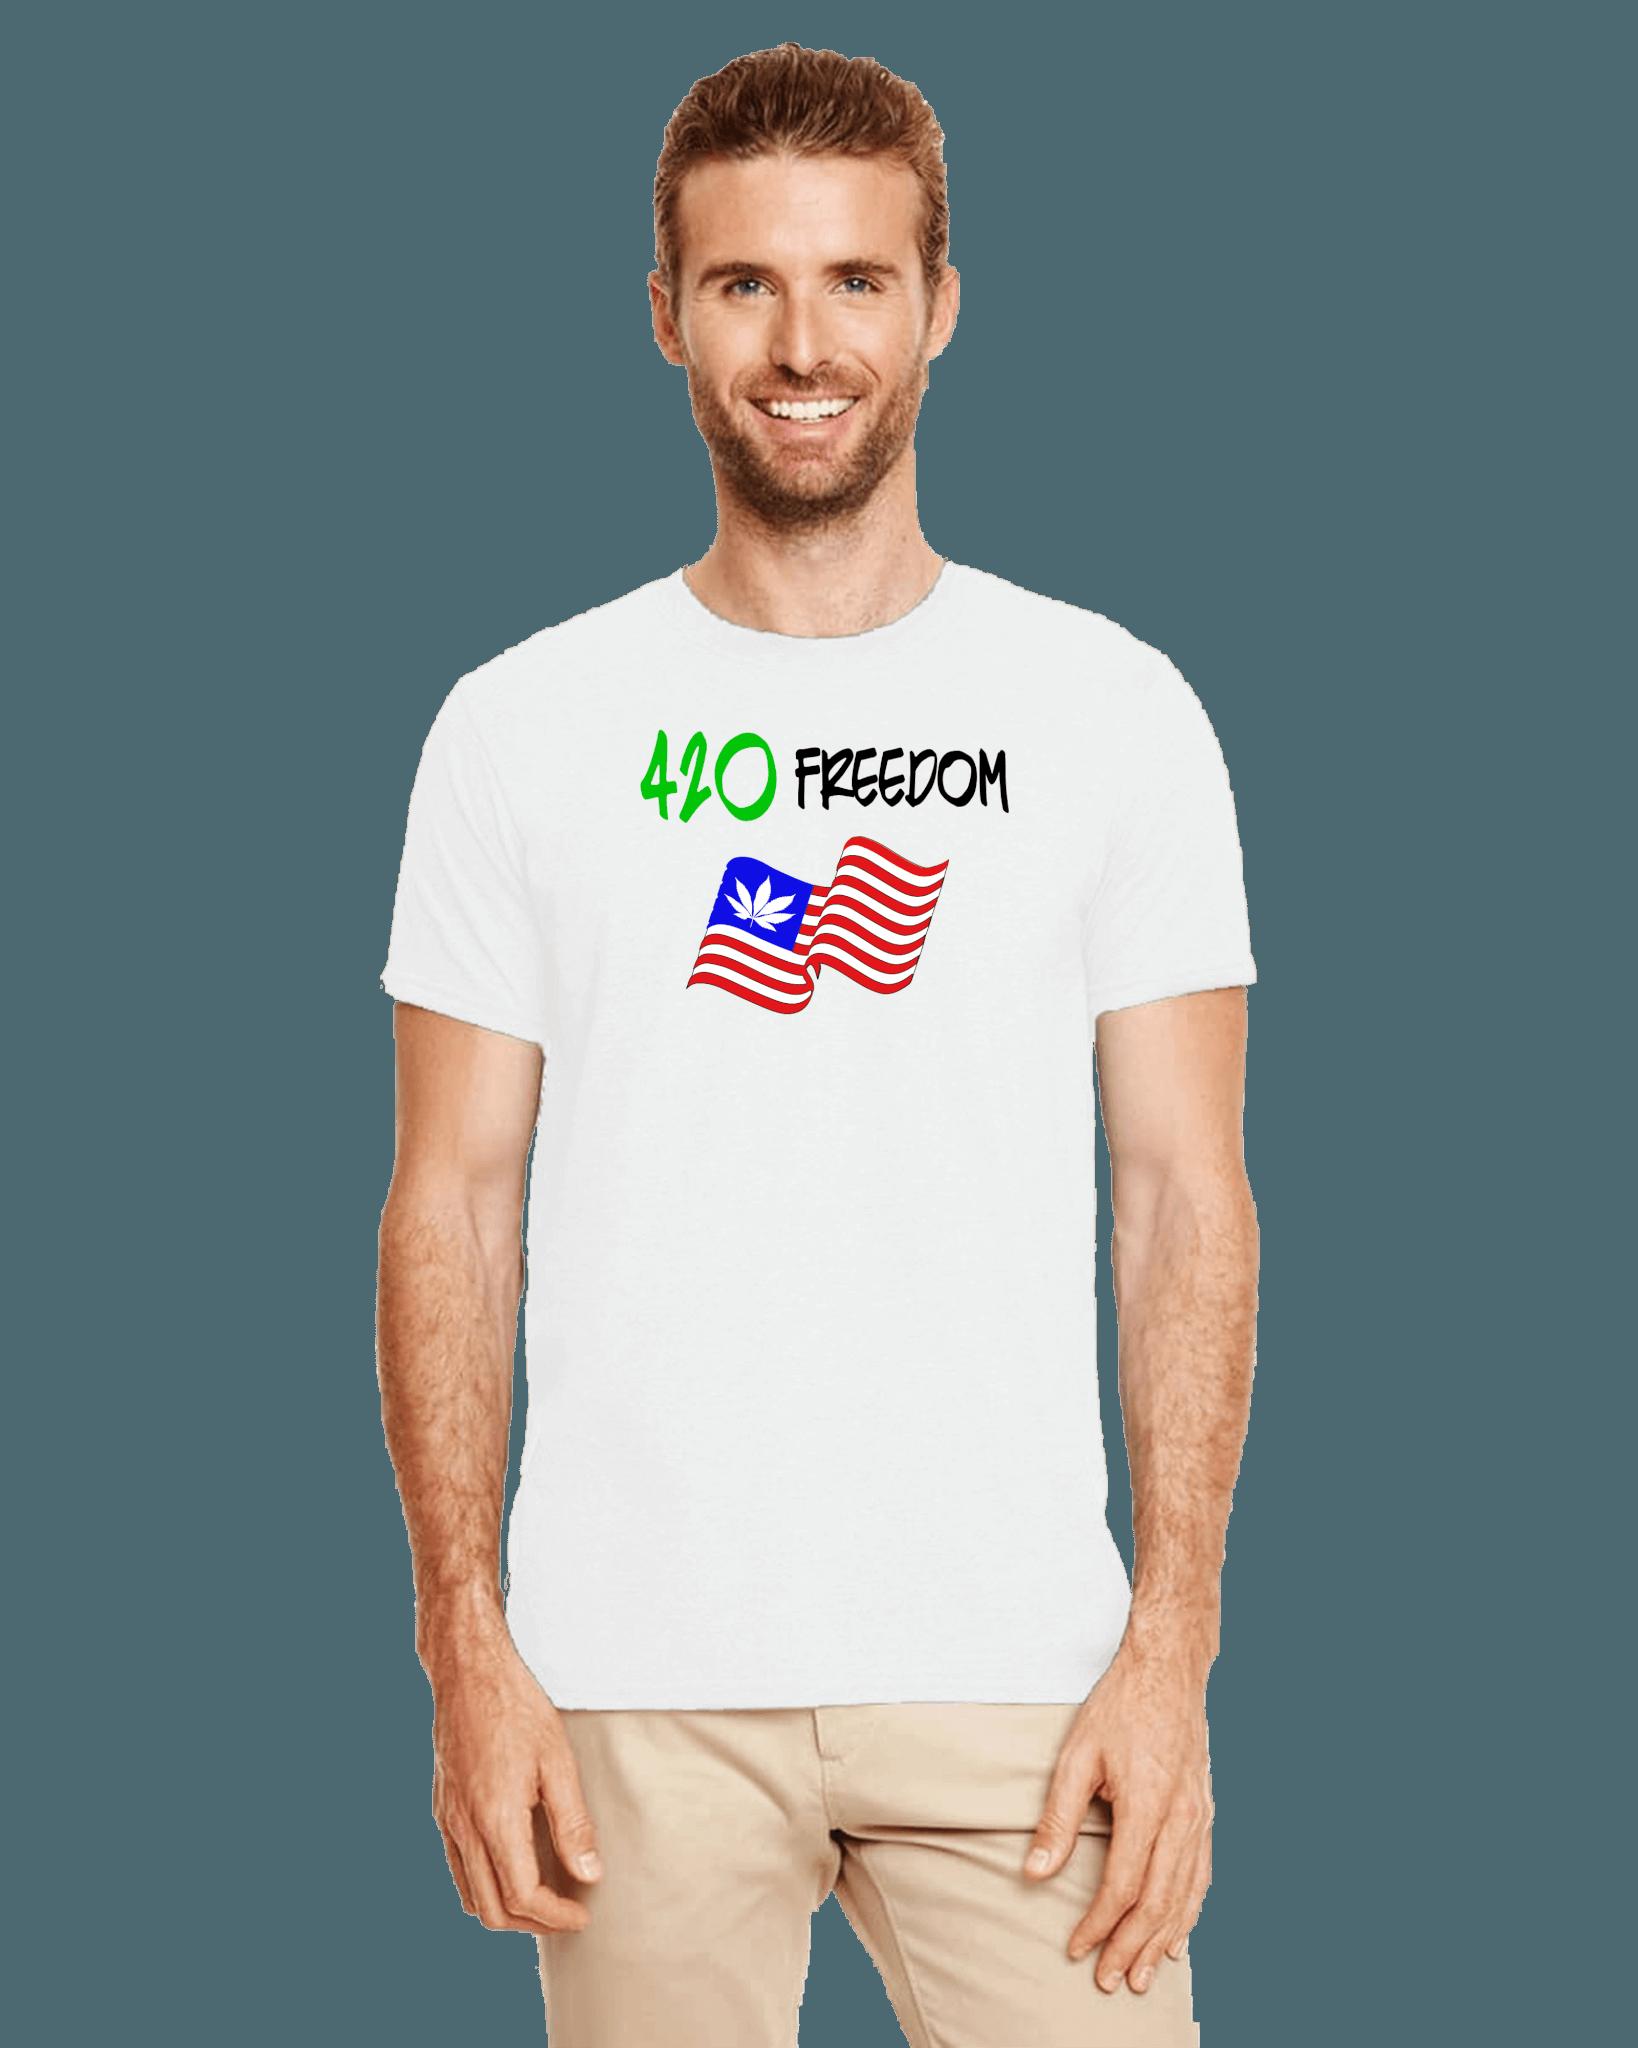 420 freedom 420 t-shirt white